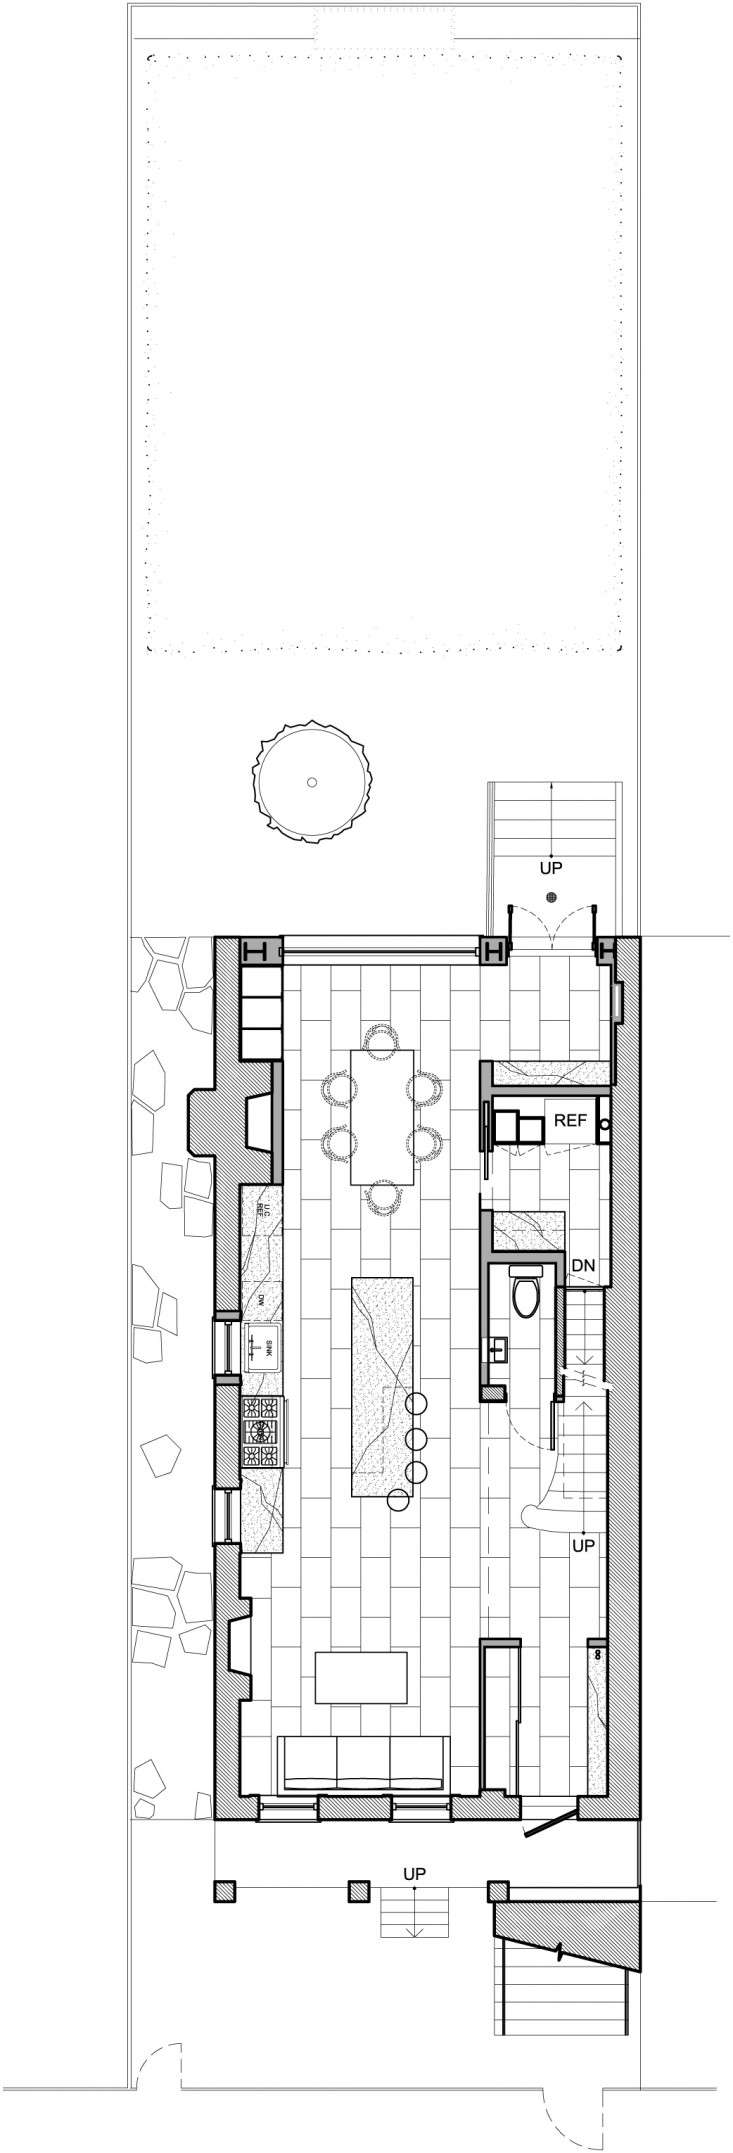 Annabelle Selldorf Brooklyn kitchen renovation layout